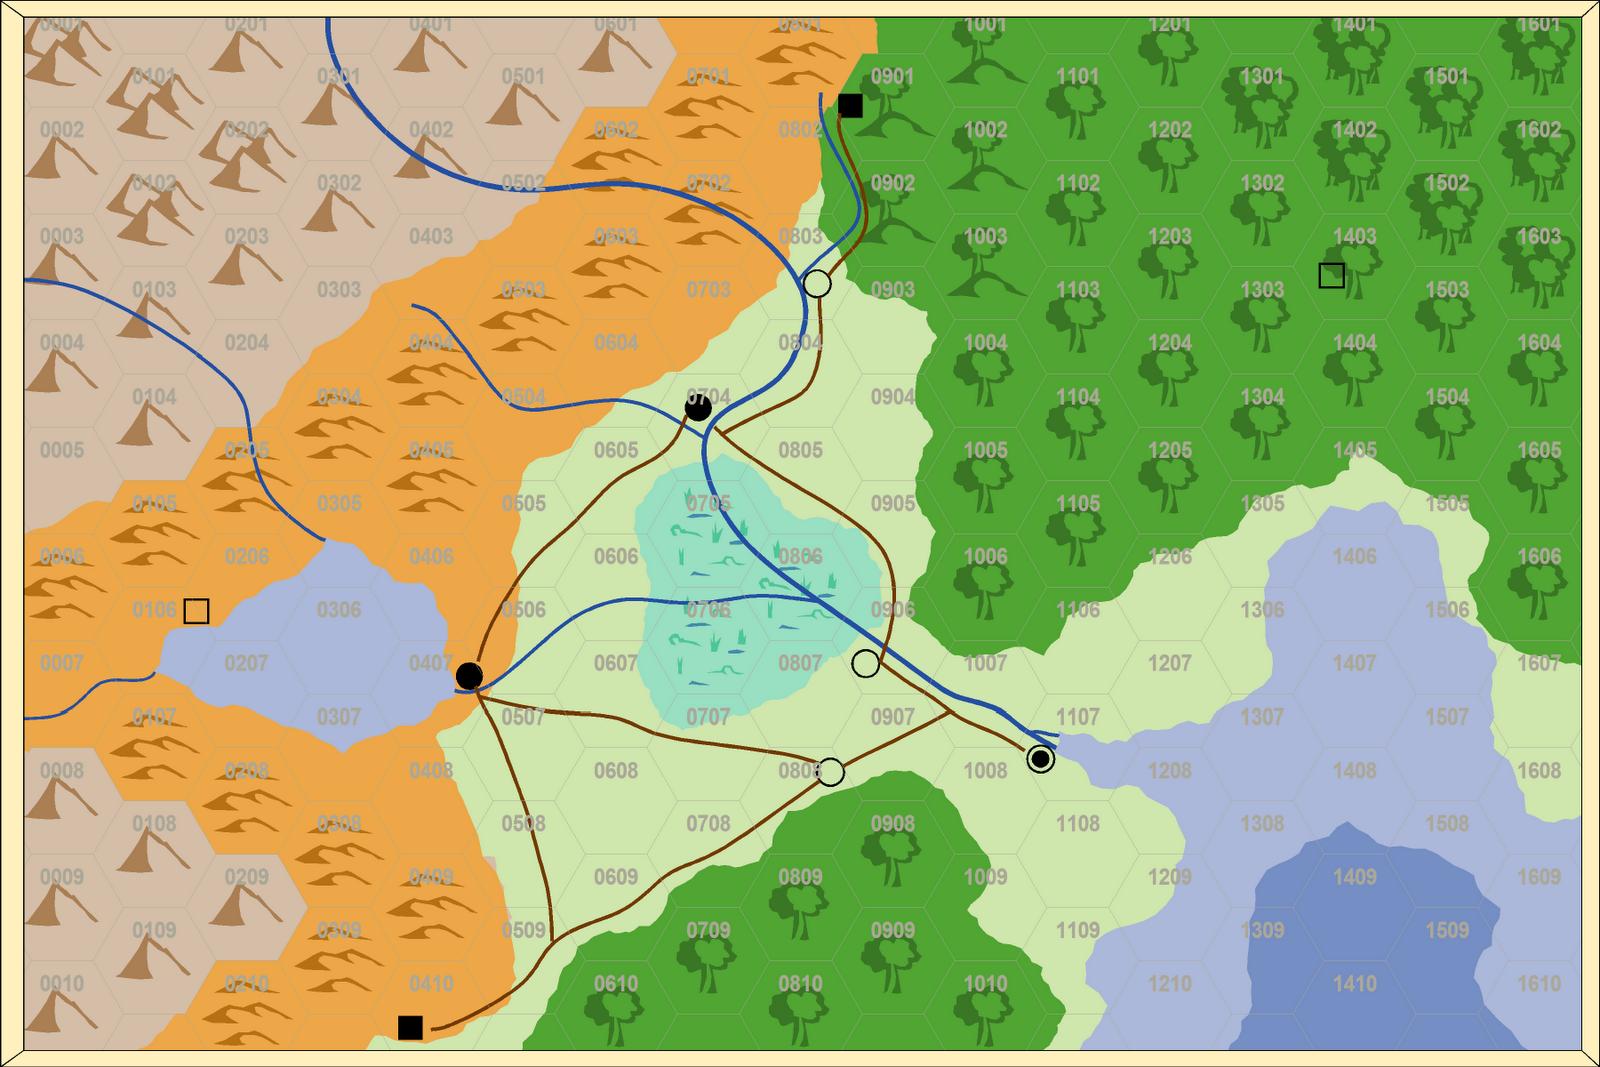 Dagger Run Hex Crawl Map Redo - Map how far i ran